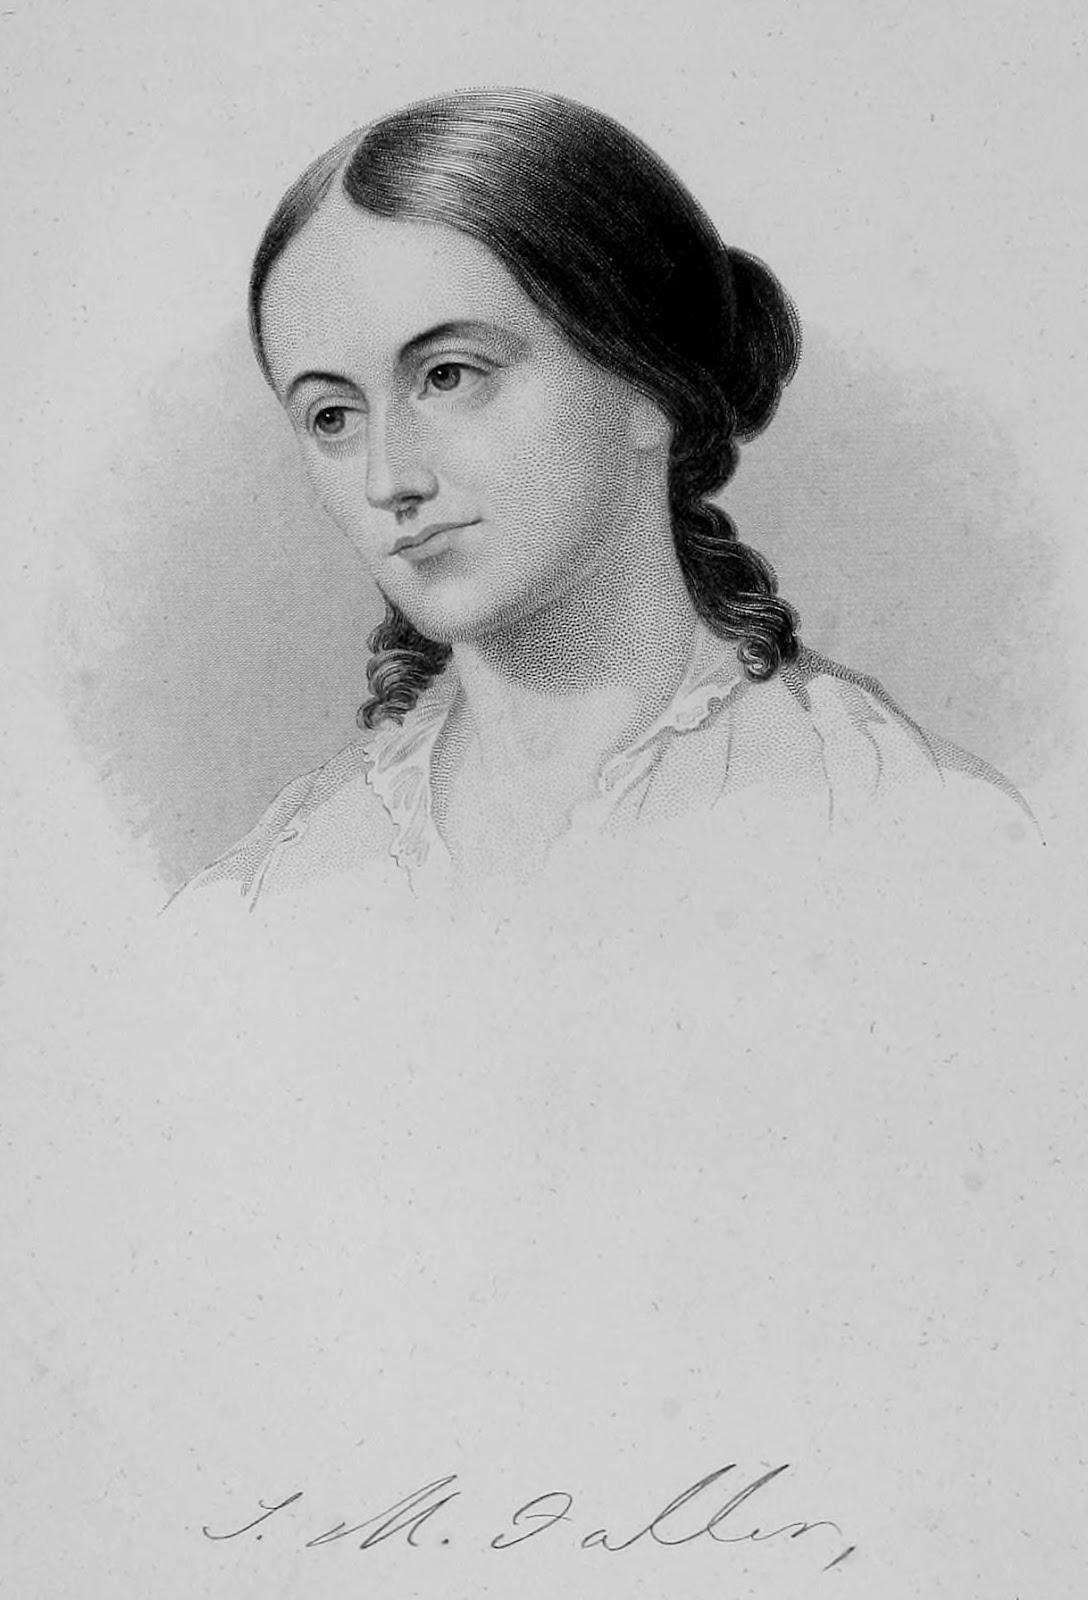 a biography of sarah margaret fuller Sarah margaret, as fuller was known to her family, was born in 1810, the first  child of margarett crane fuller and timothy fuller, jr margaret fuller's father,.